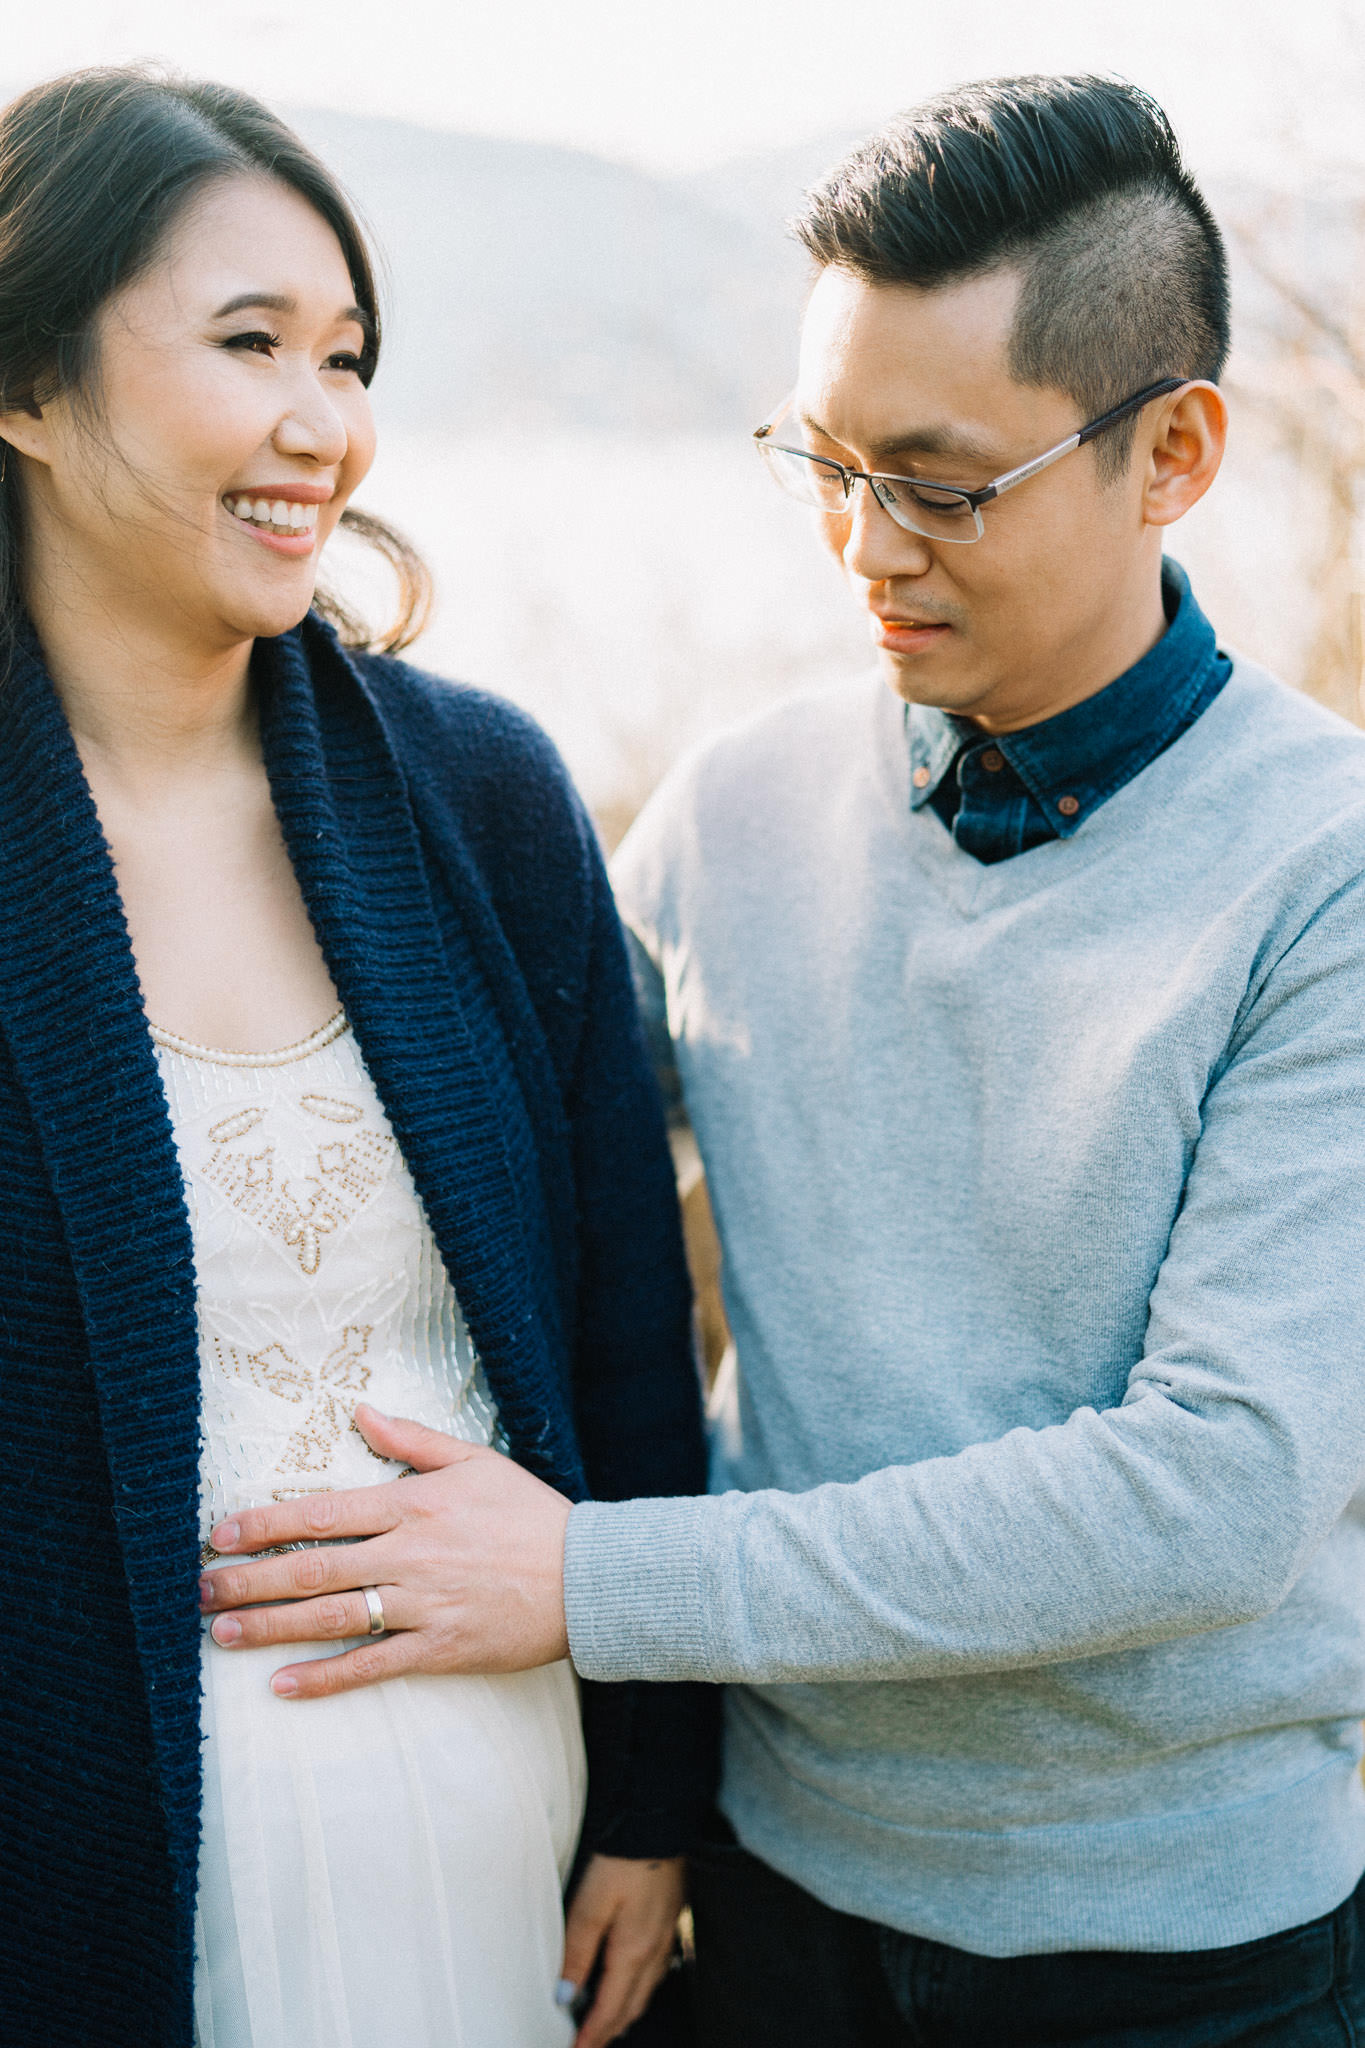 vancouver-maternity-photography-014.jpg